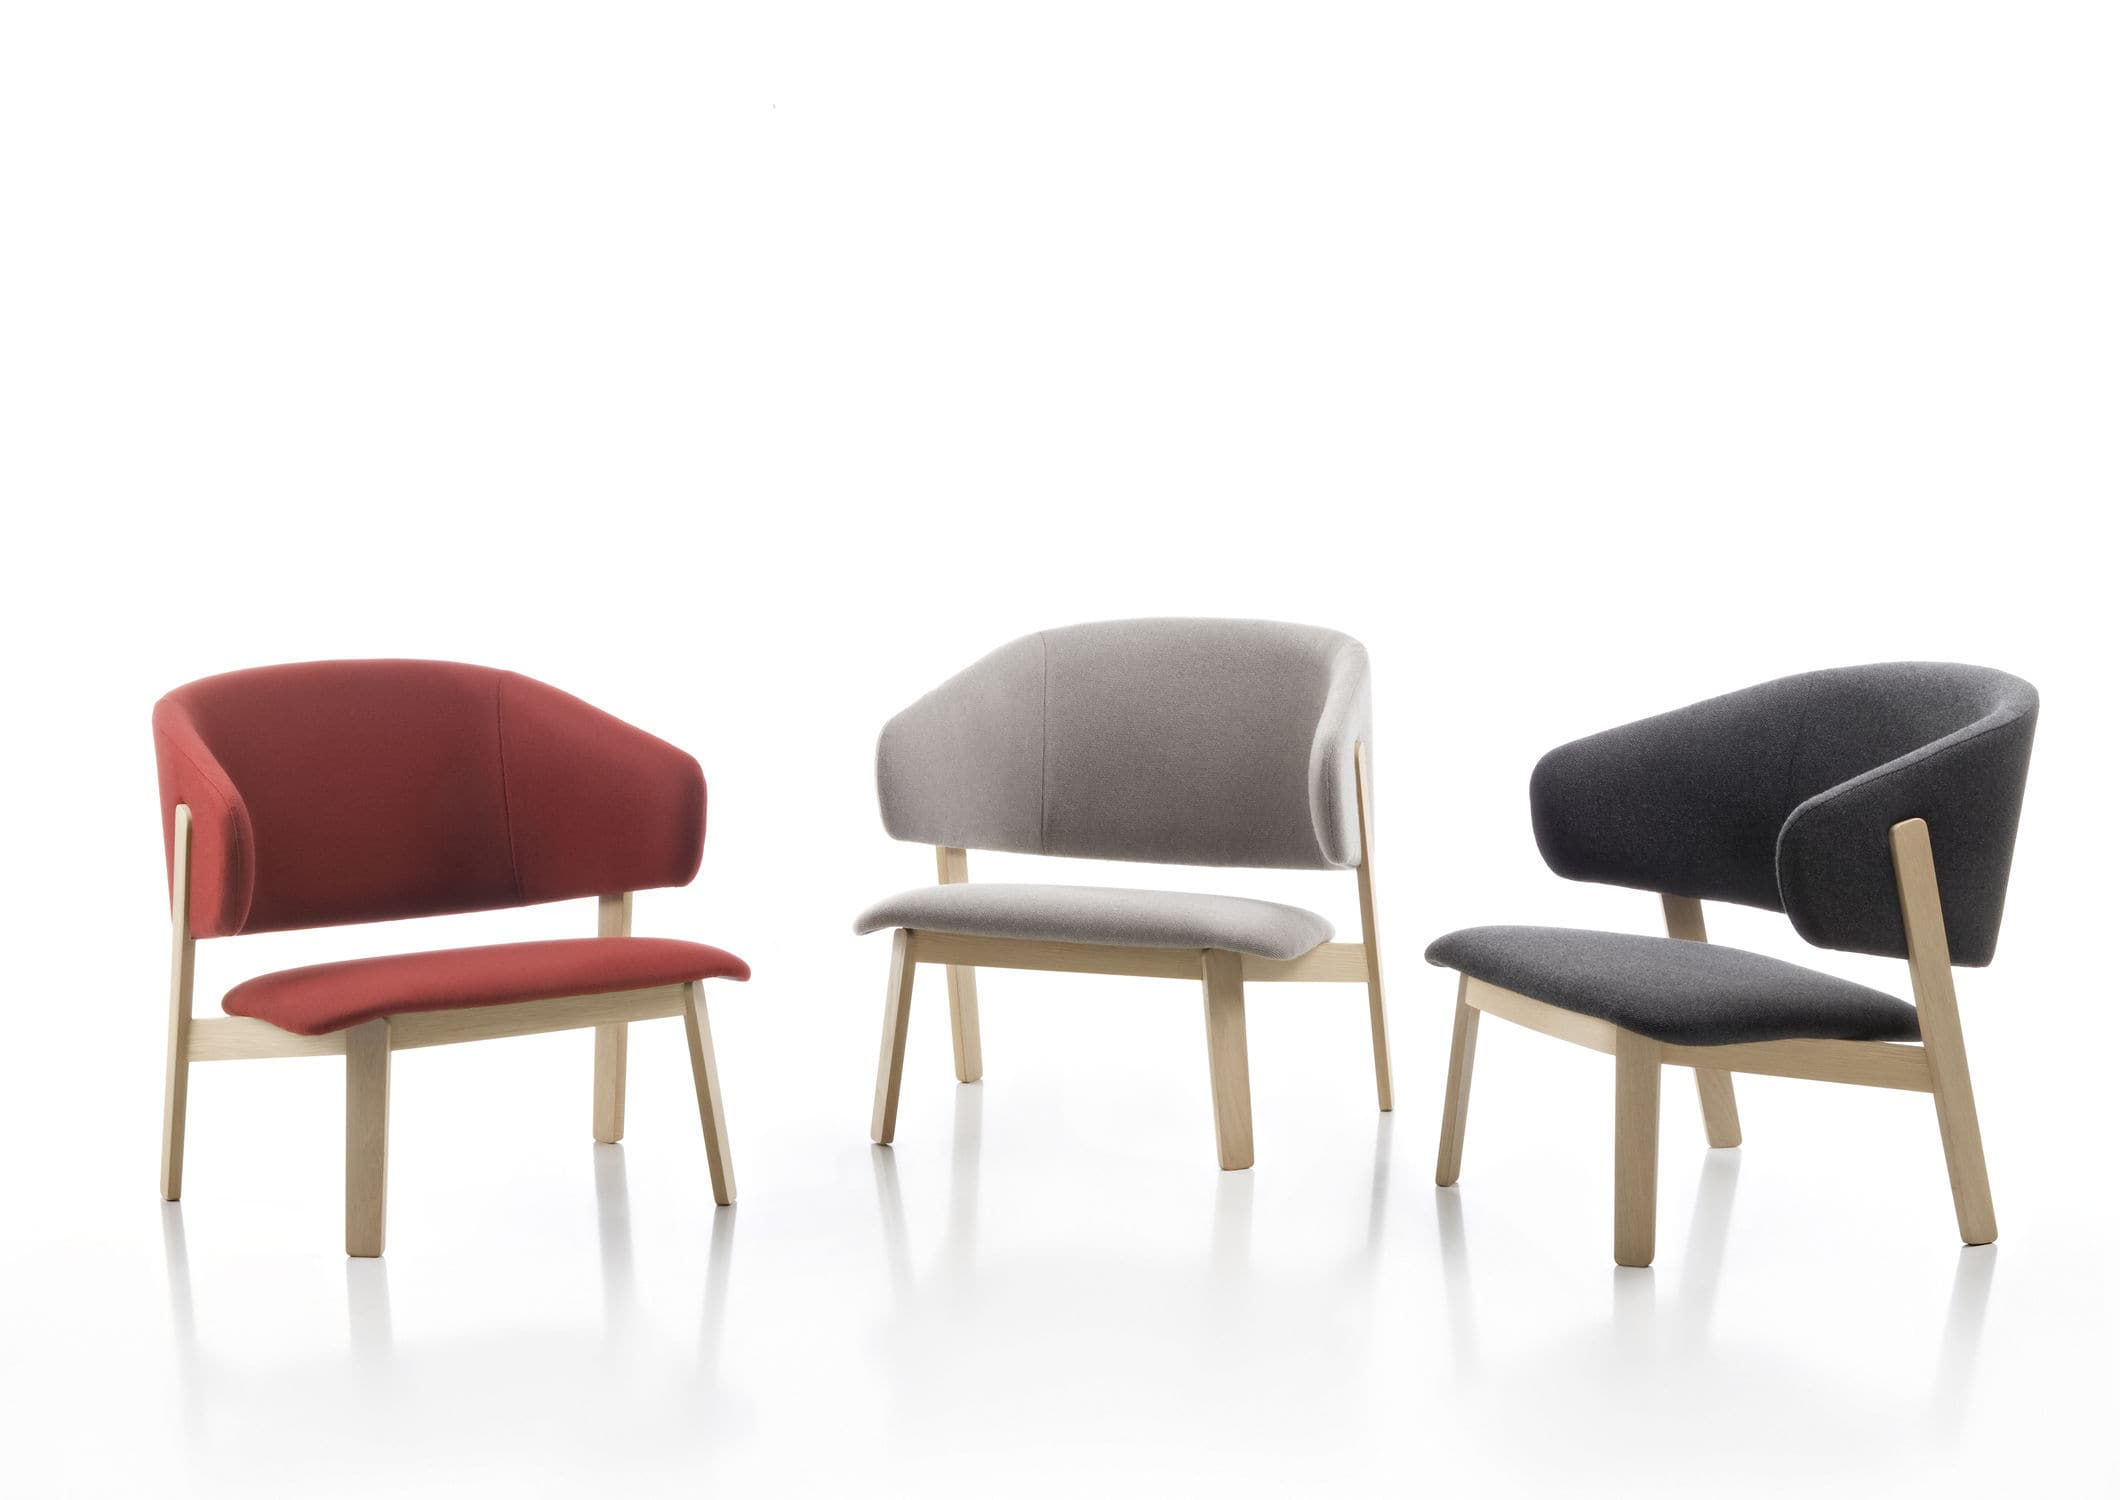 Fauteuil design scandinave en bois en tissu en cuir WOLFGANG